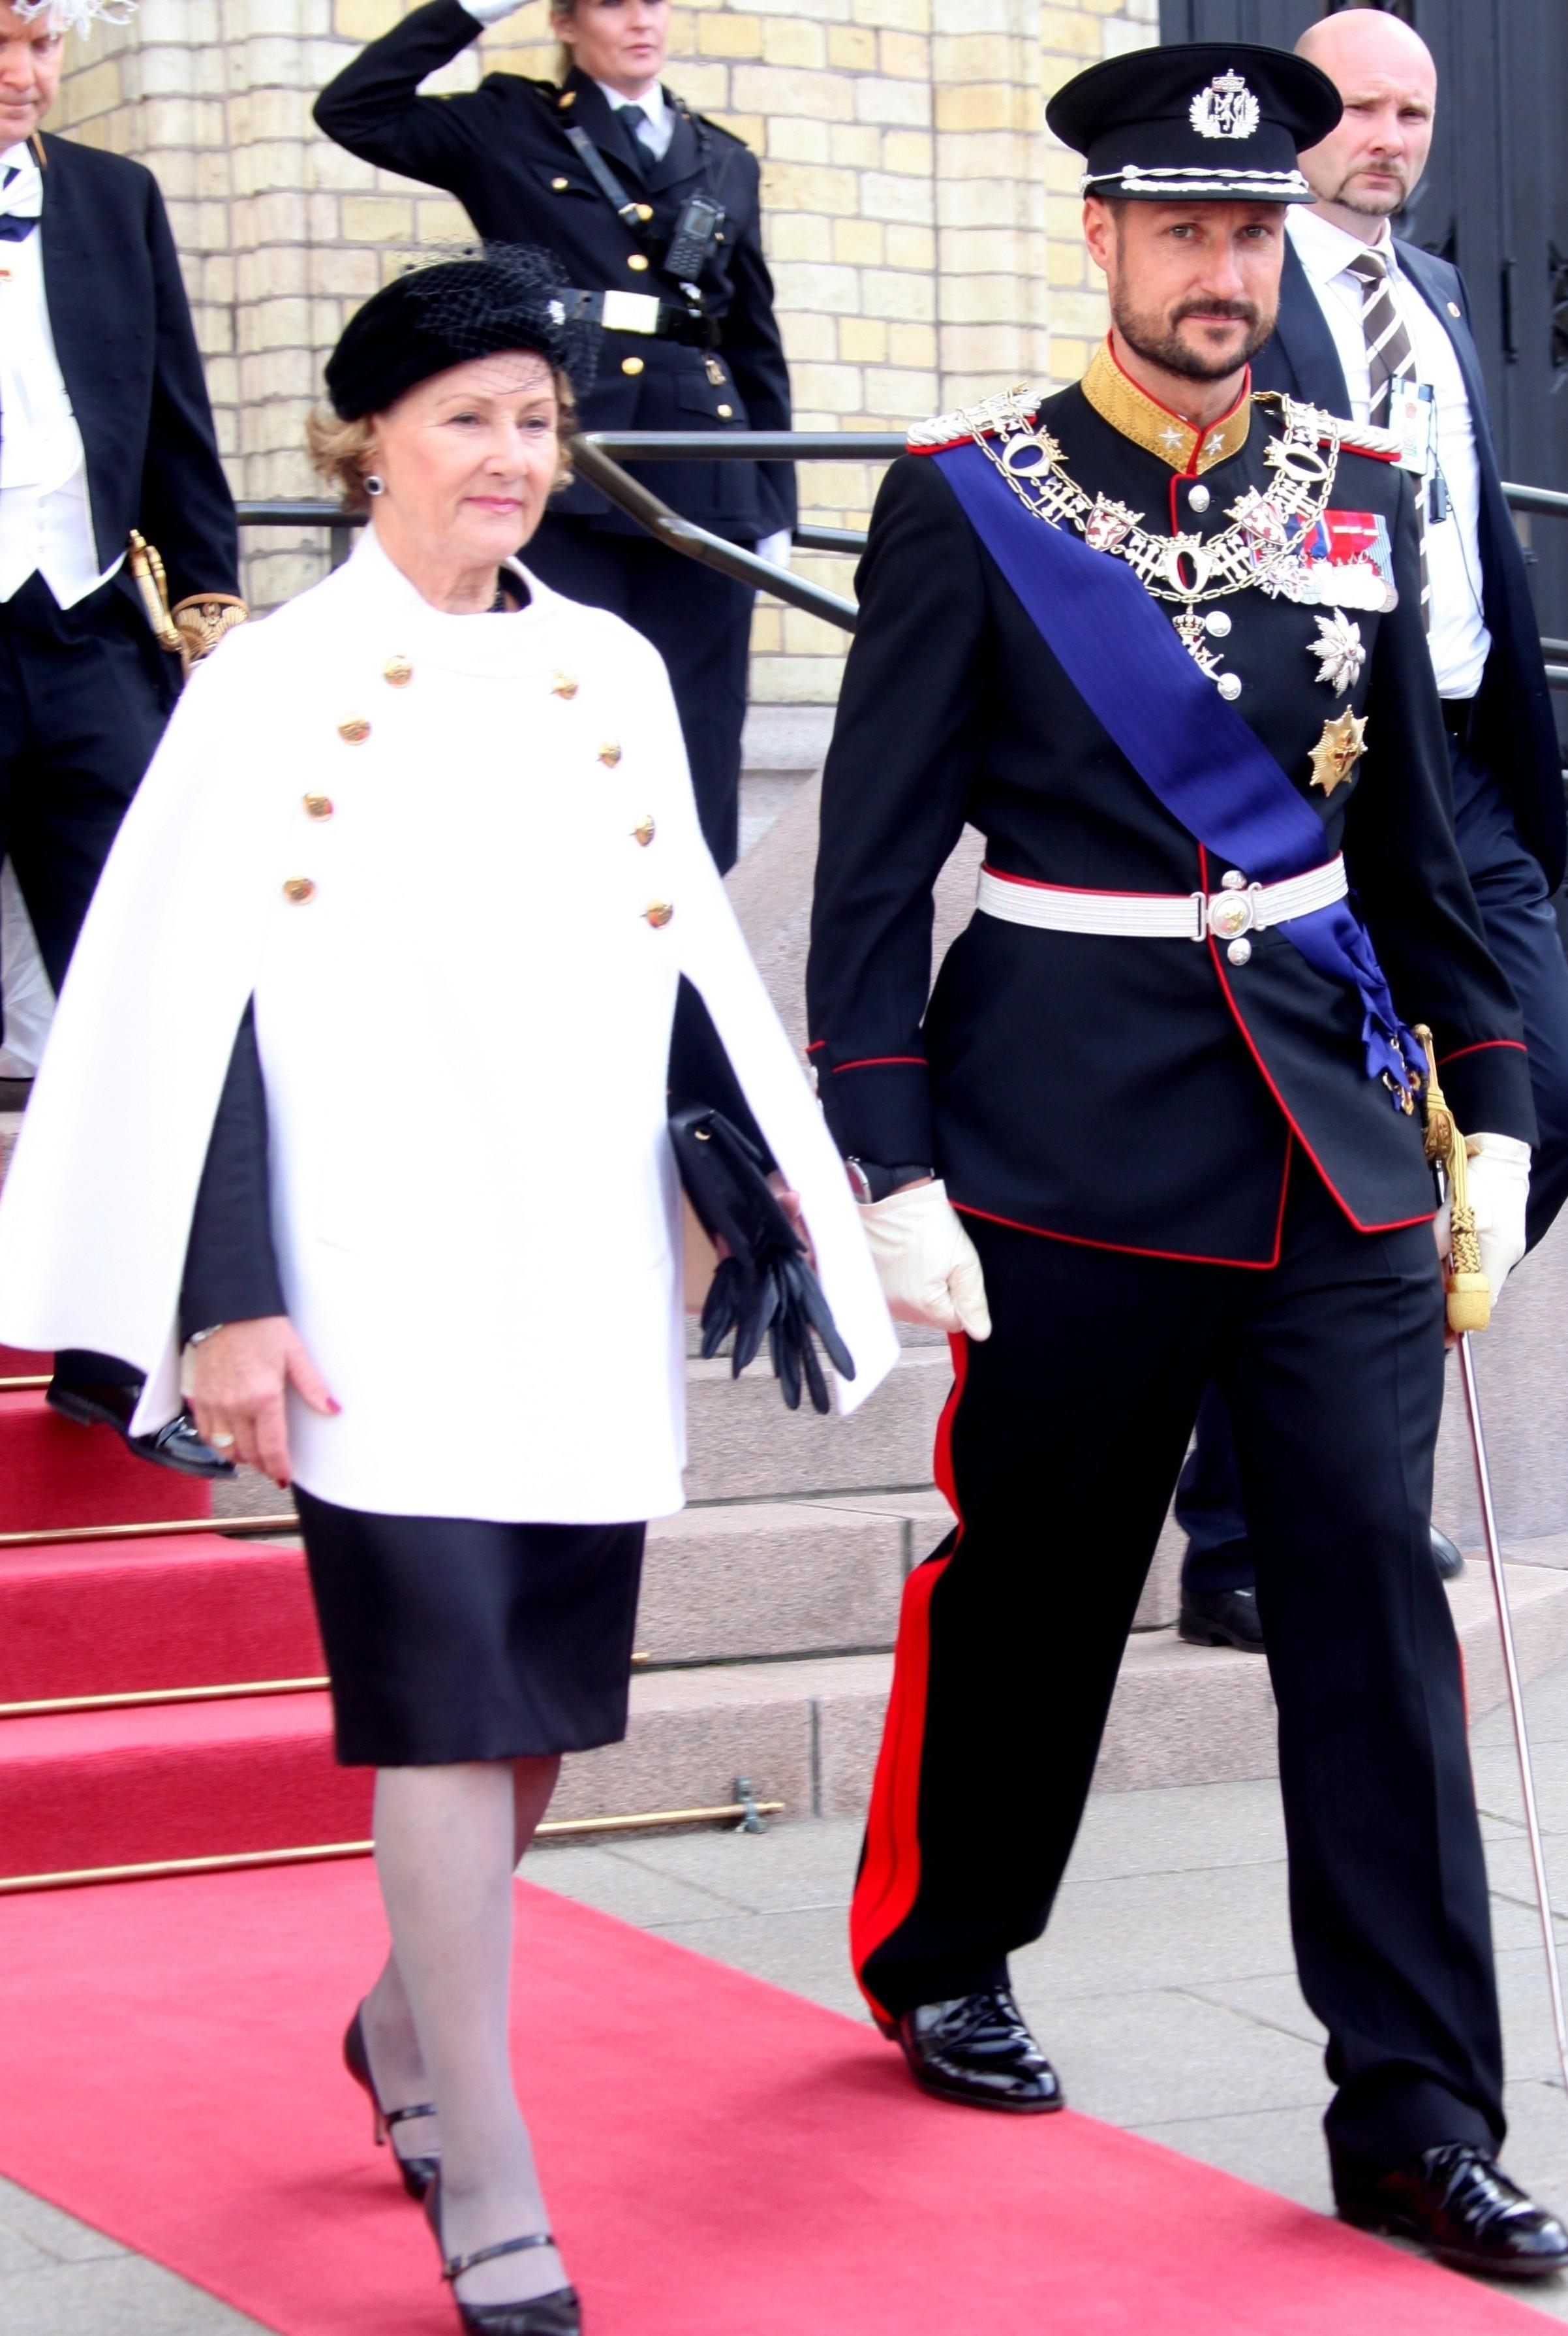 Sonja Haraldsen. Reina de Noruega - Página 11 Ste_the_opening__3129418-e1381333514162